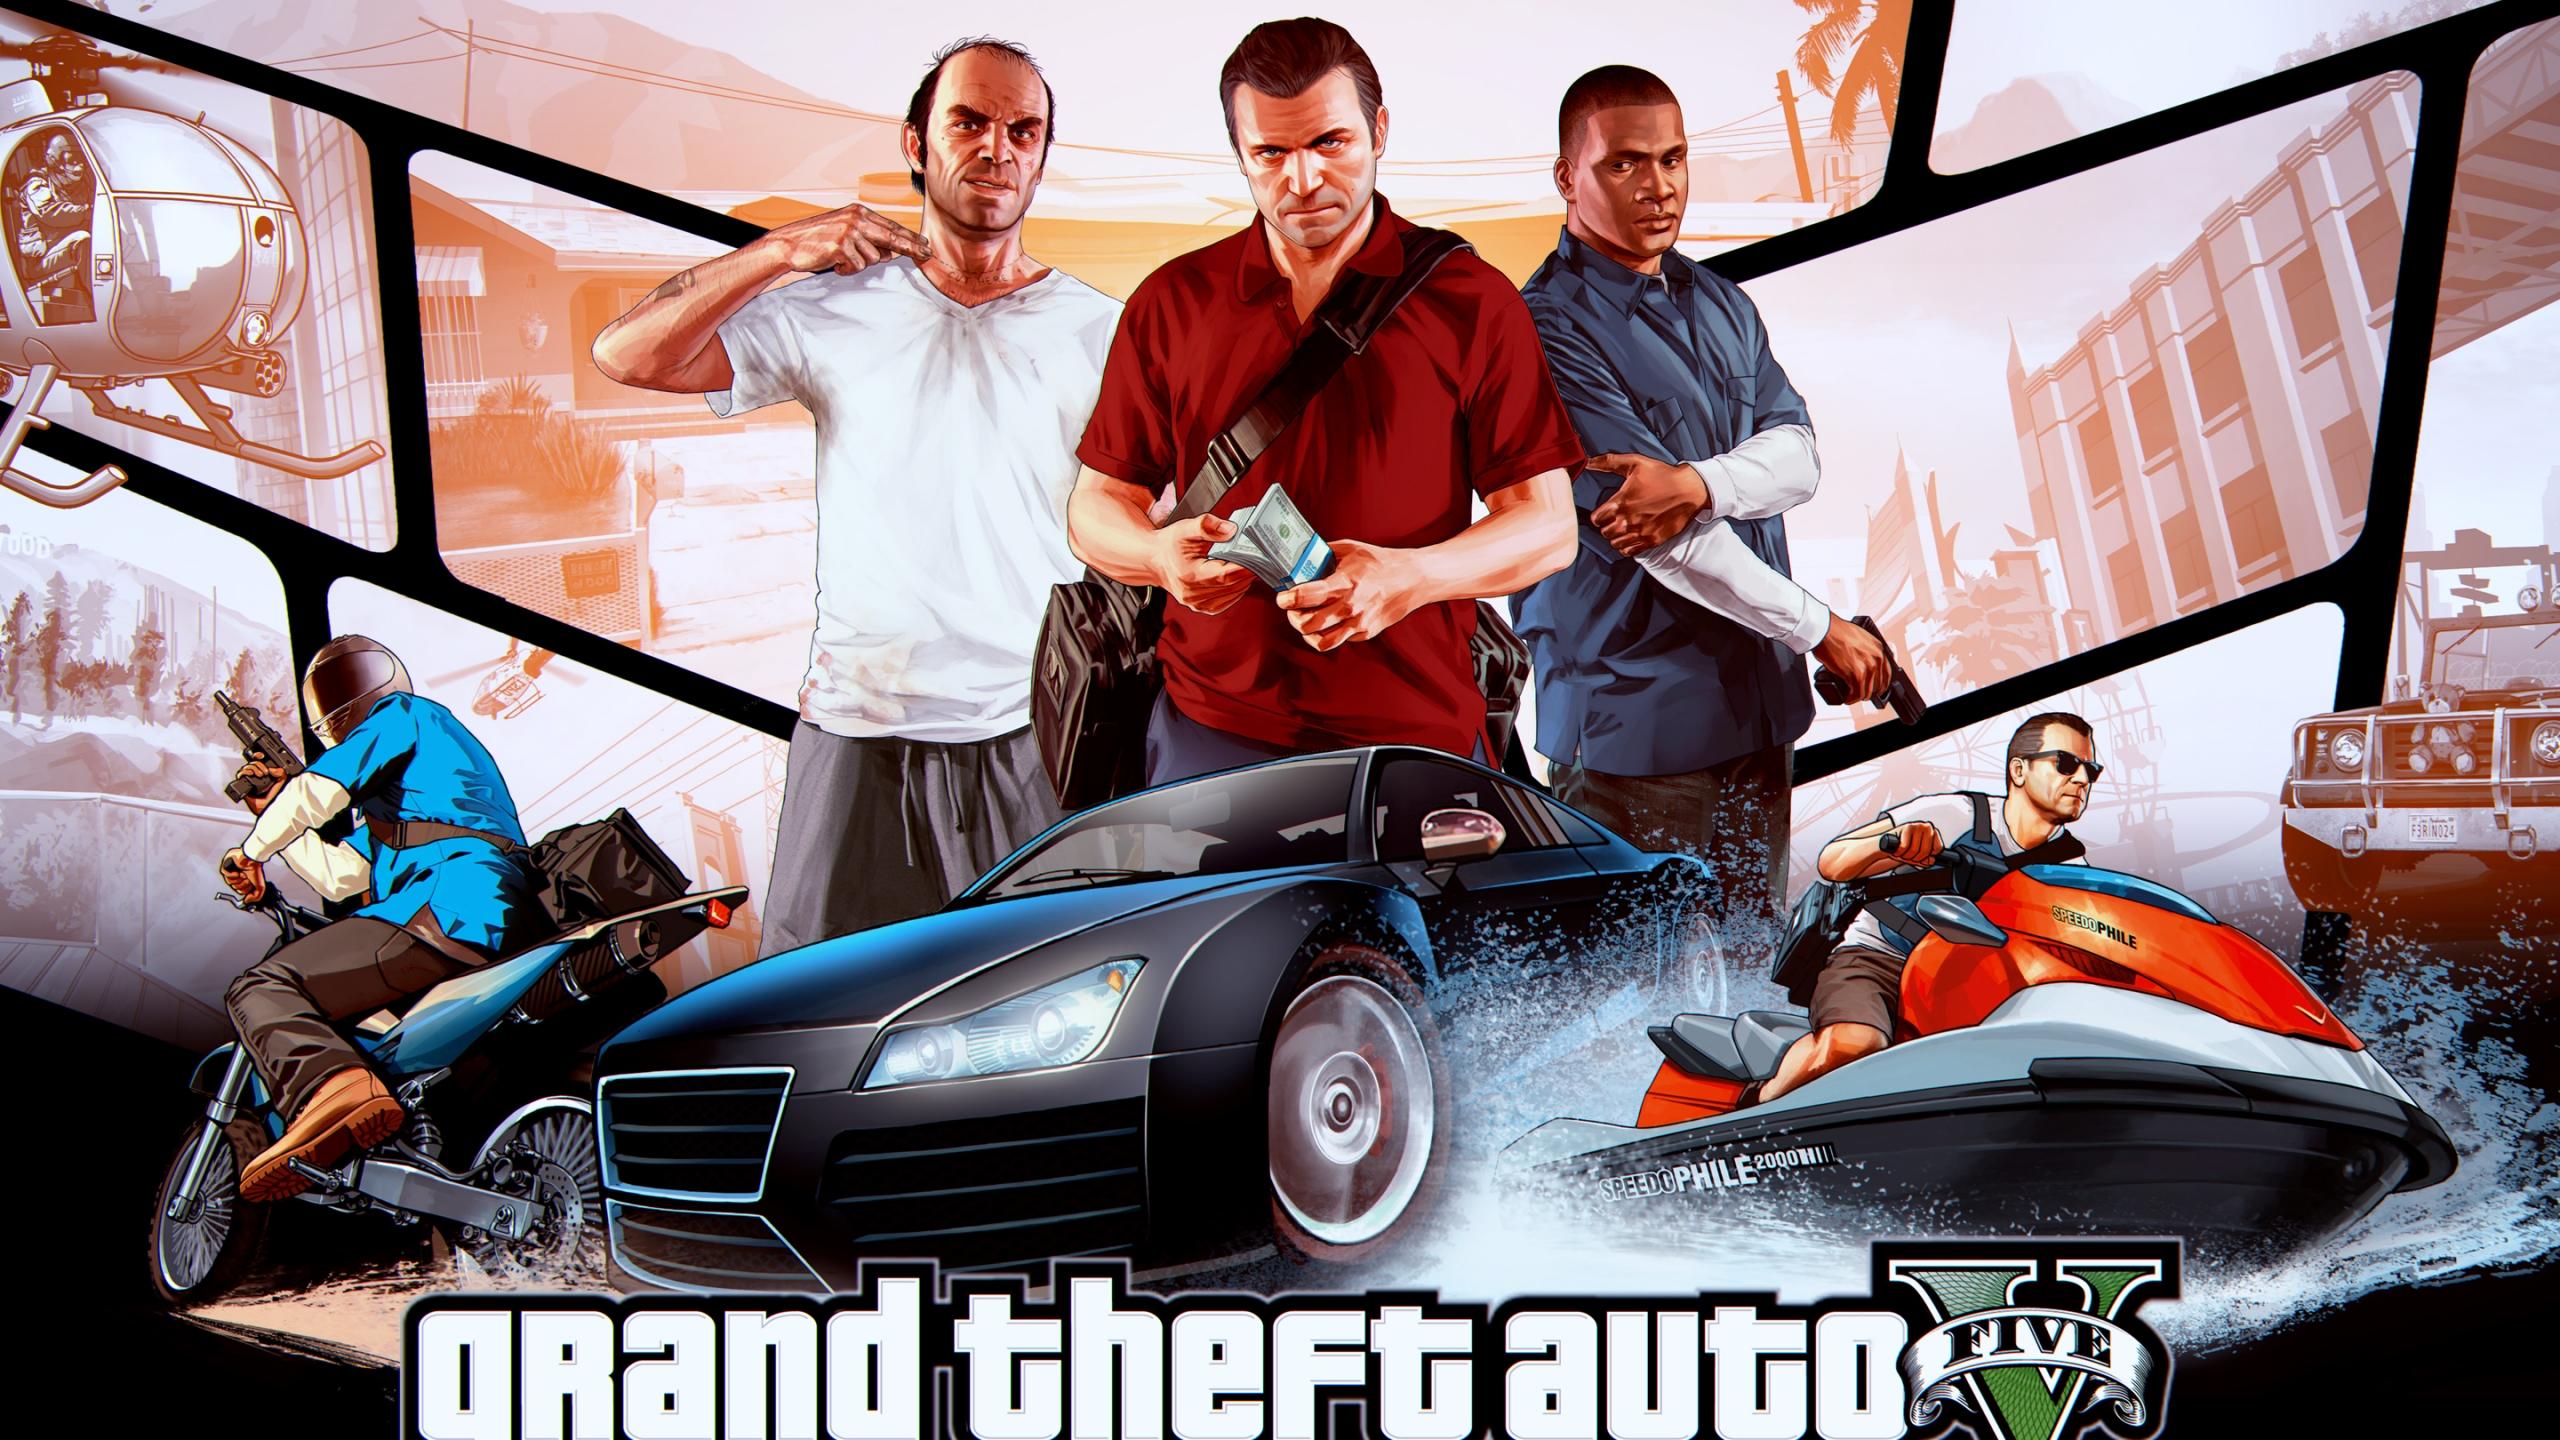 Grand Theft Auto V 2560x1440